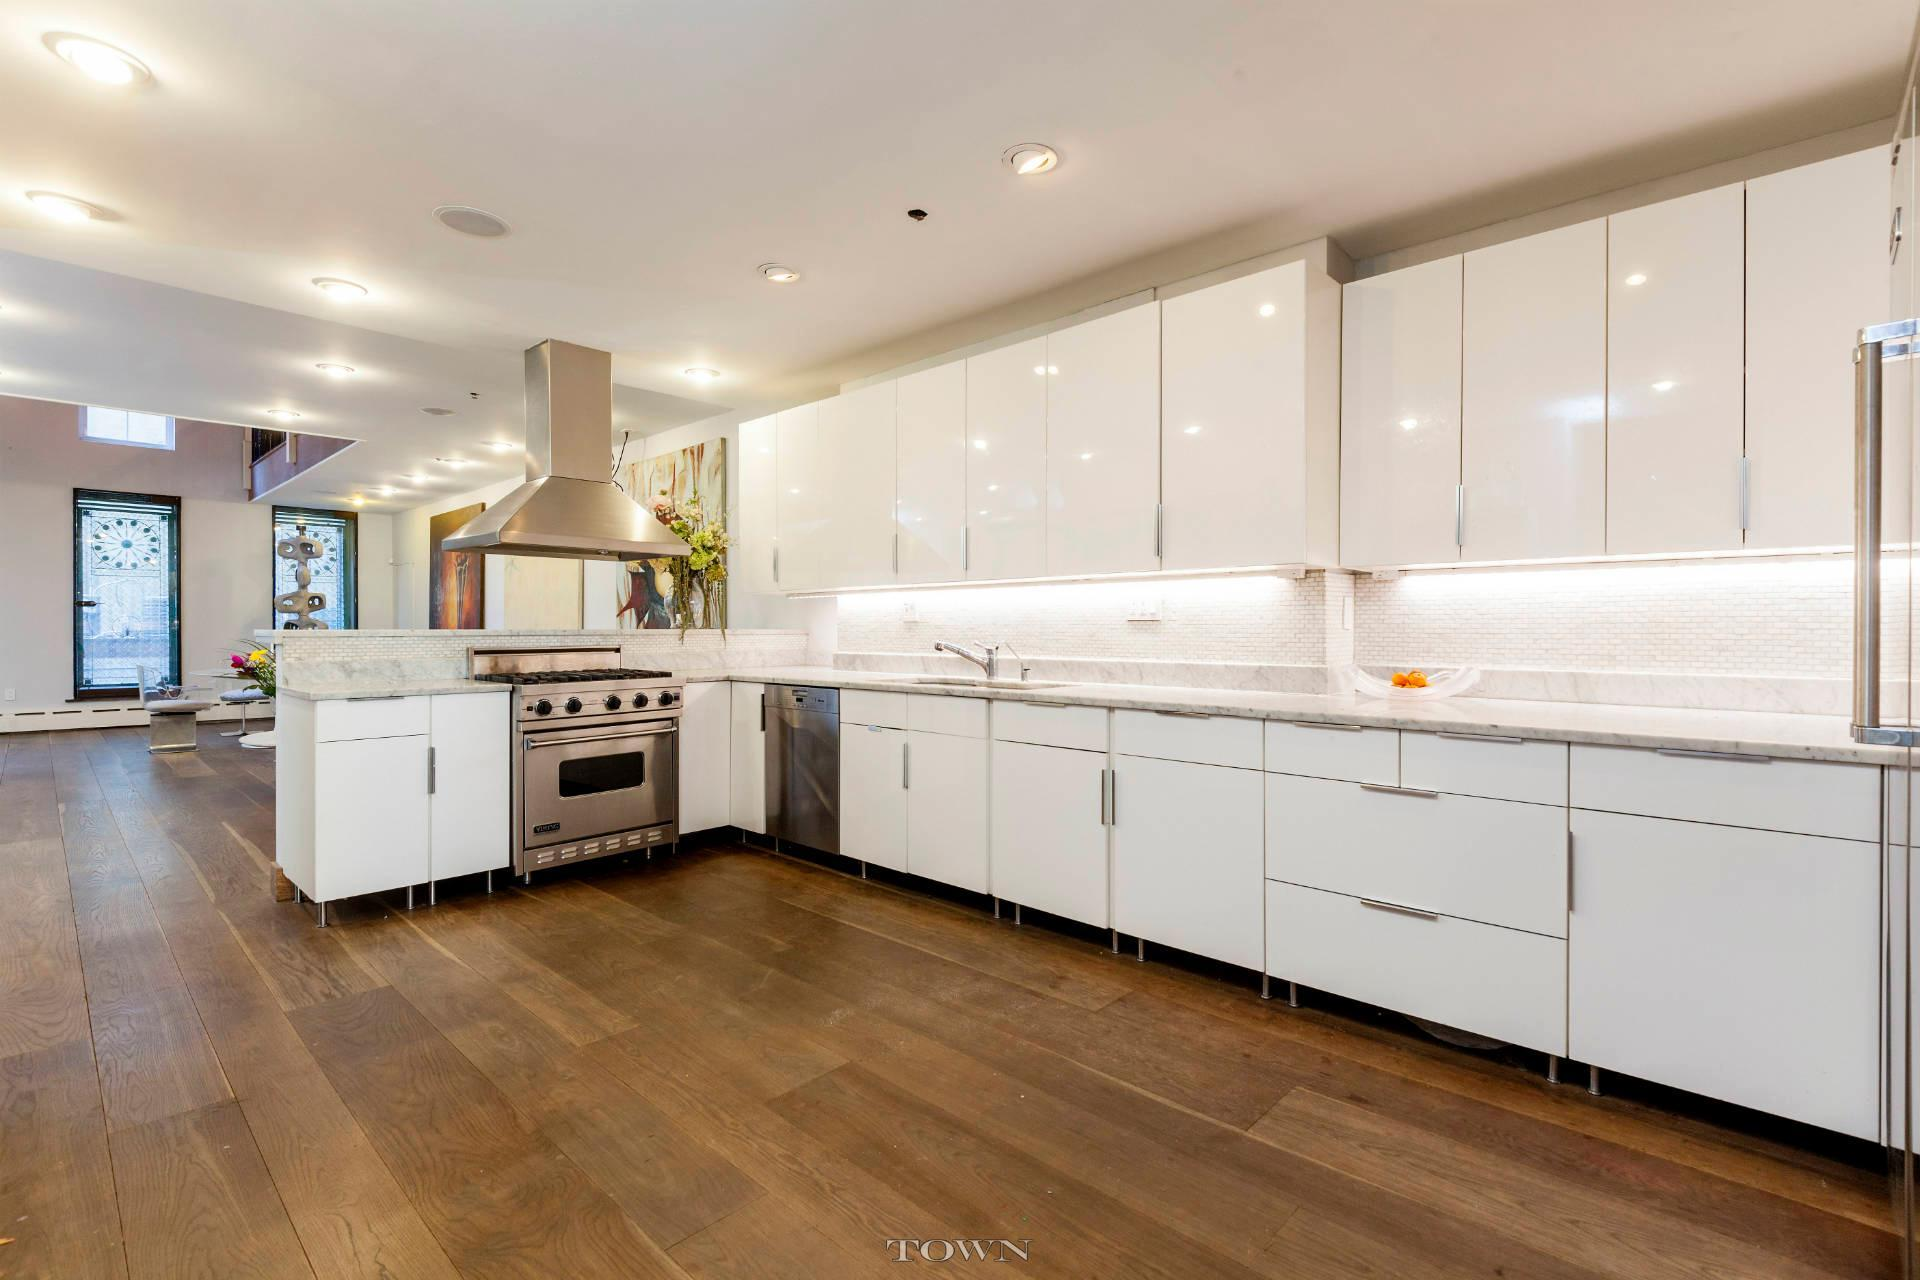 12 Avenue A, kitchen, rental, east village